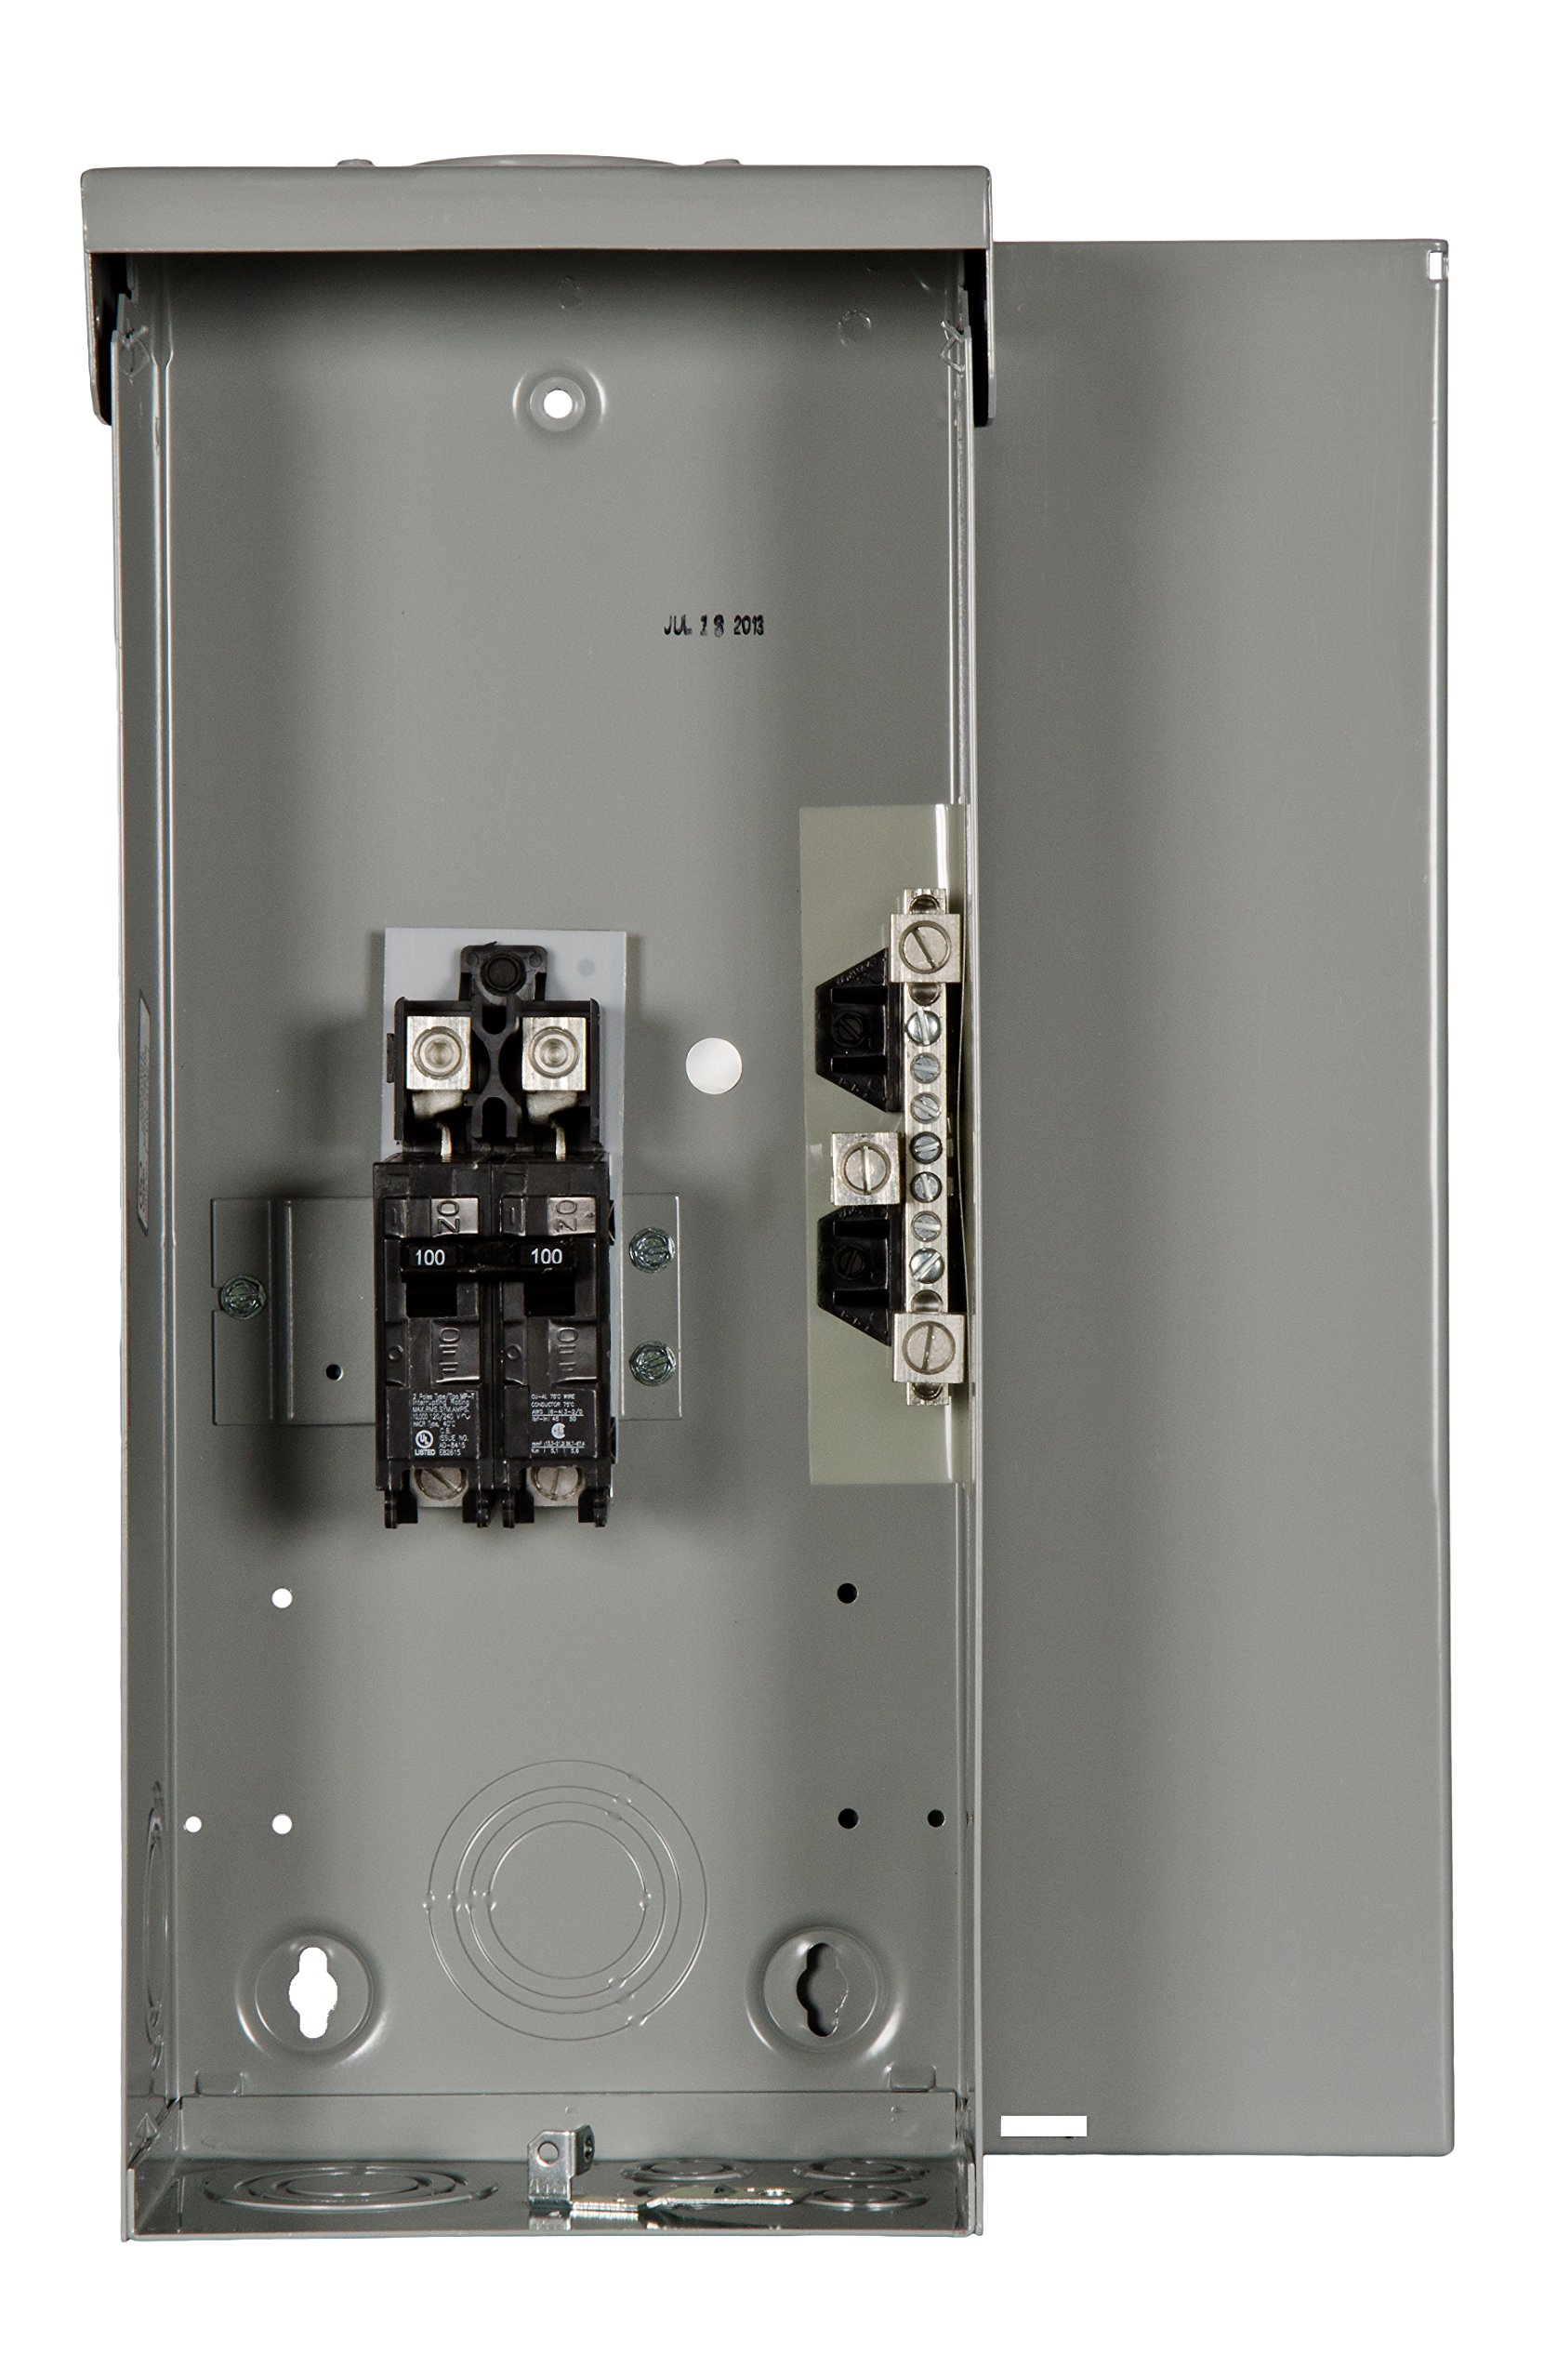 Murray LW100CRU 100A Circuit Breaker enclosure, Breaker included